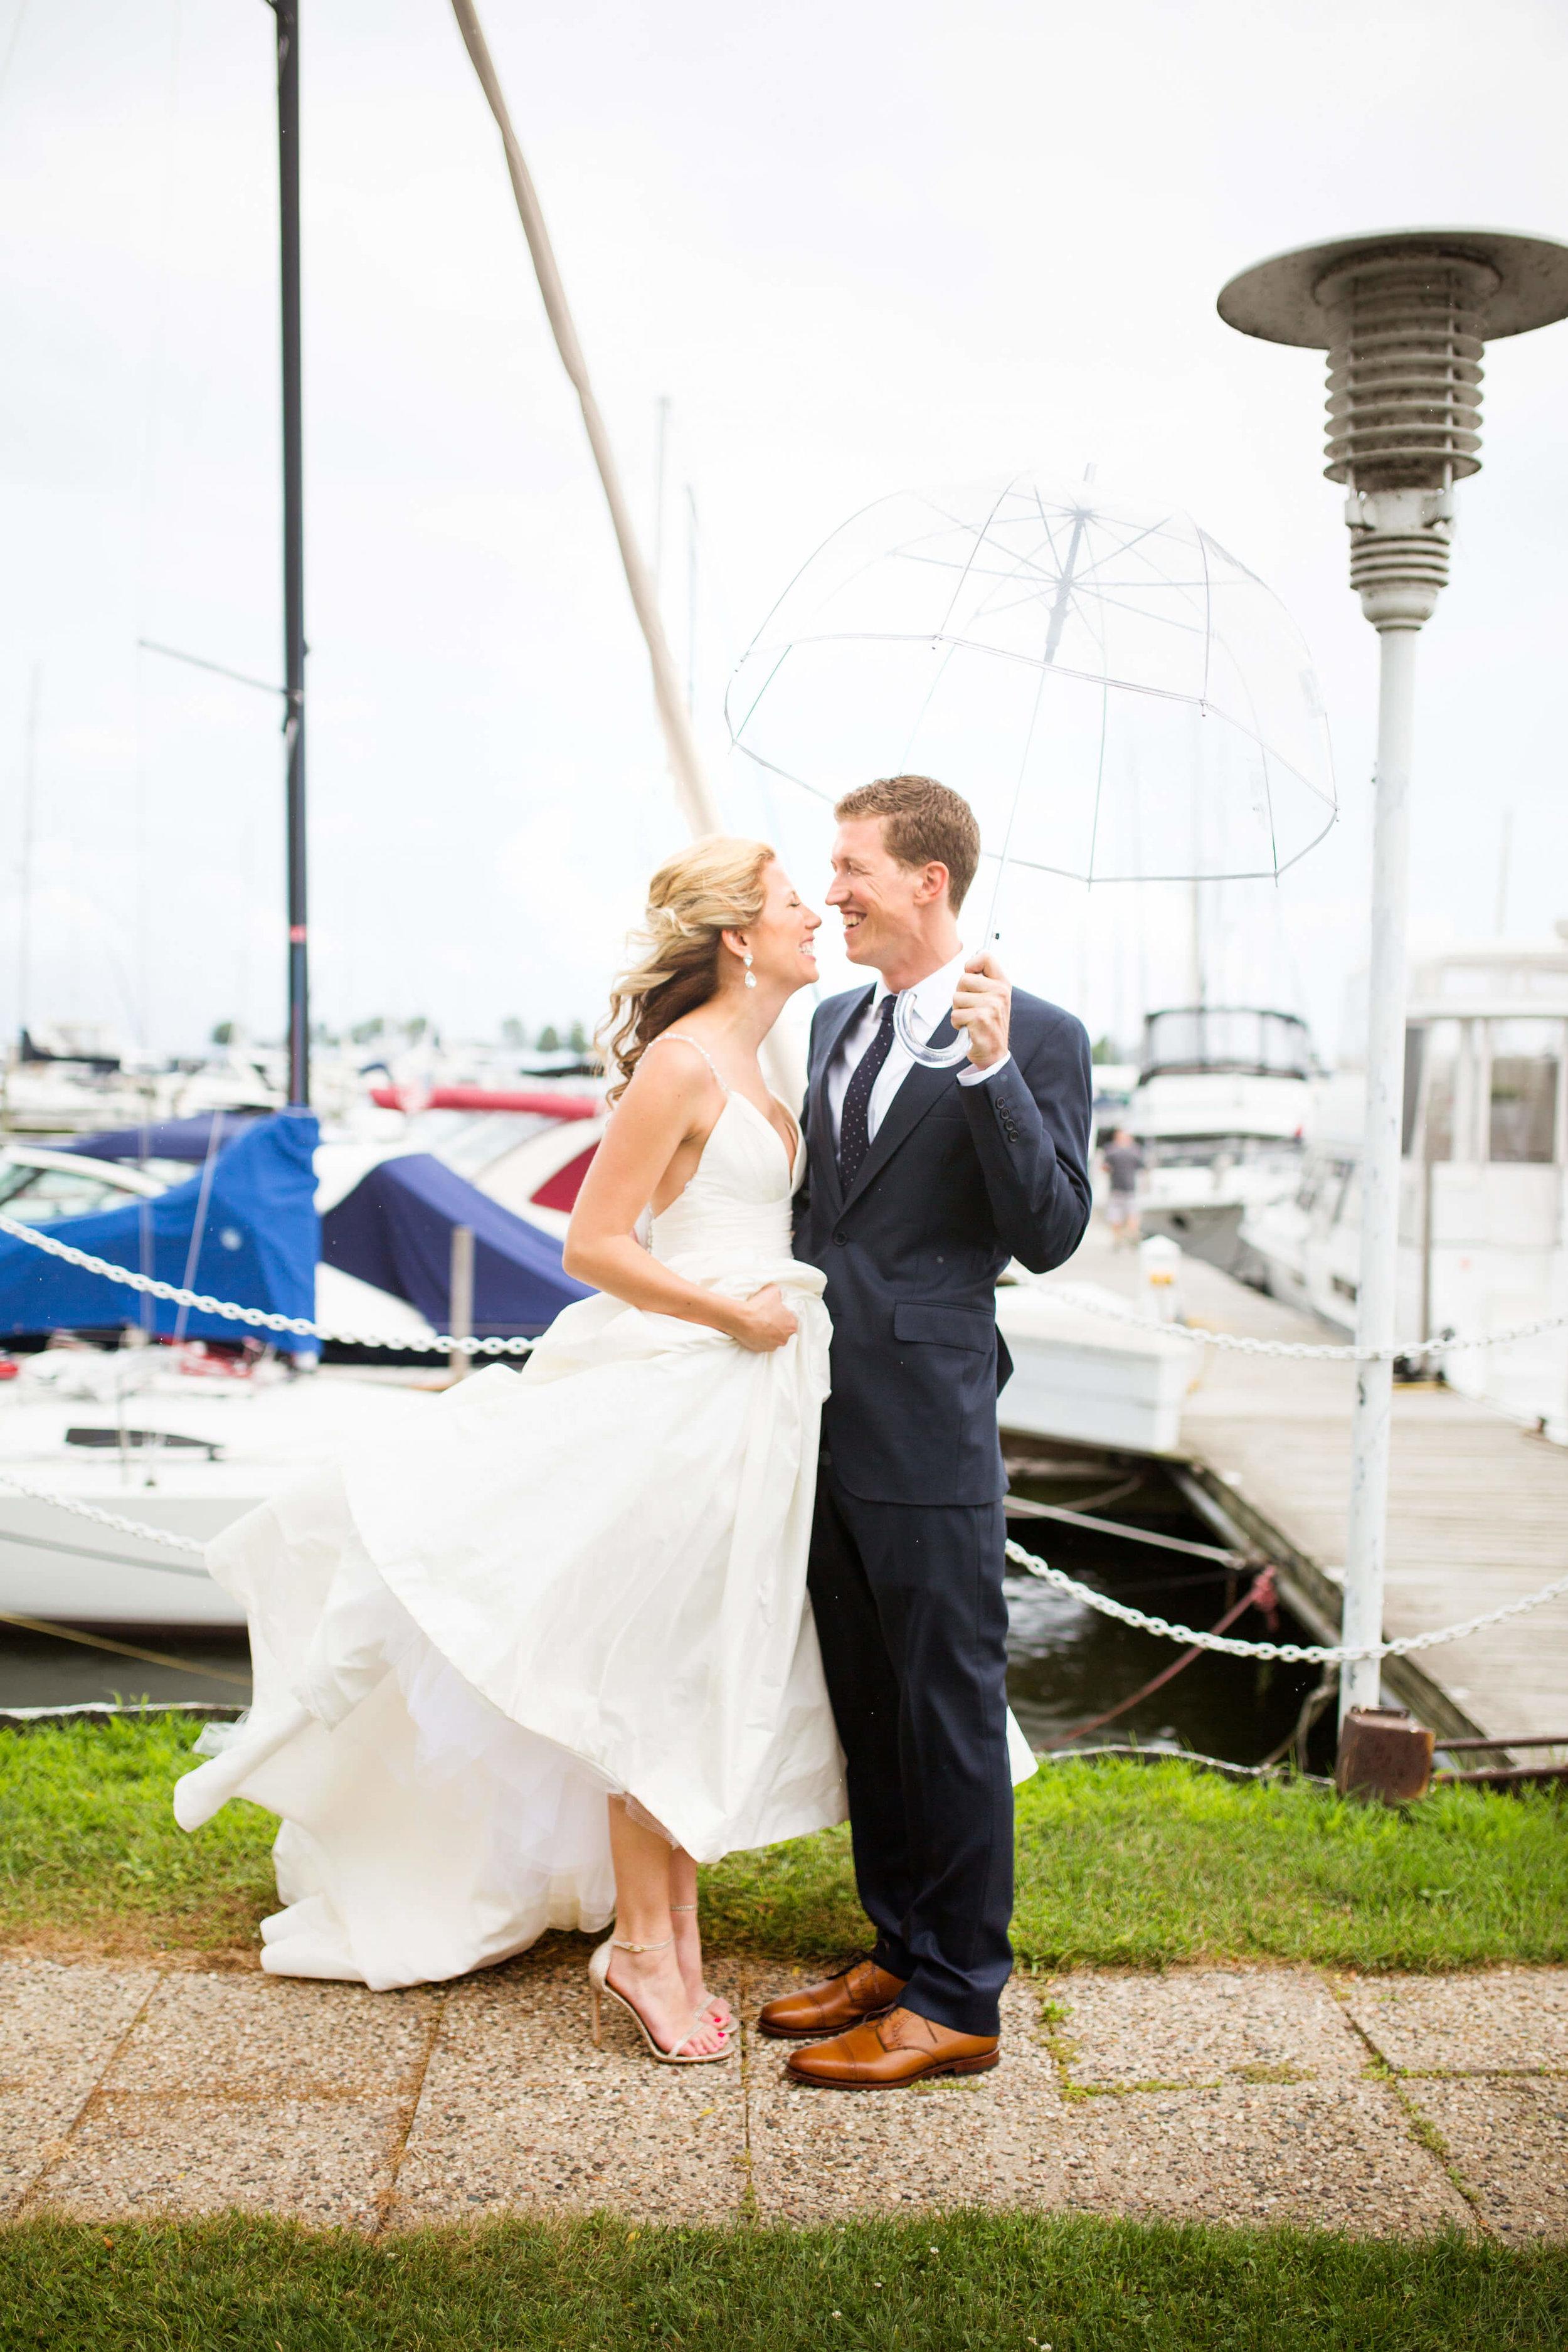 bride and groom at the marina wind swept with clear umbrella | Minnesota wedding photographer Studio KH wedding dress details | wedding blog | Sixpence Events 70 Ways to Photograph Your Wedding Dress.jpg